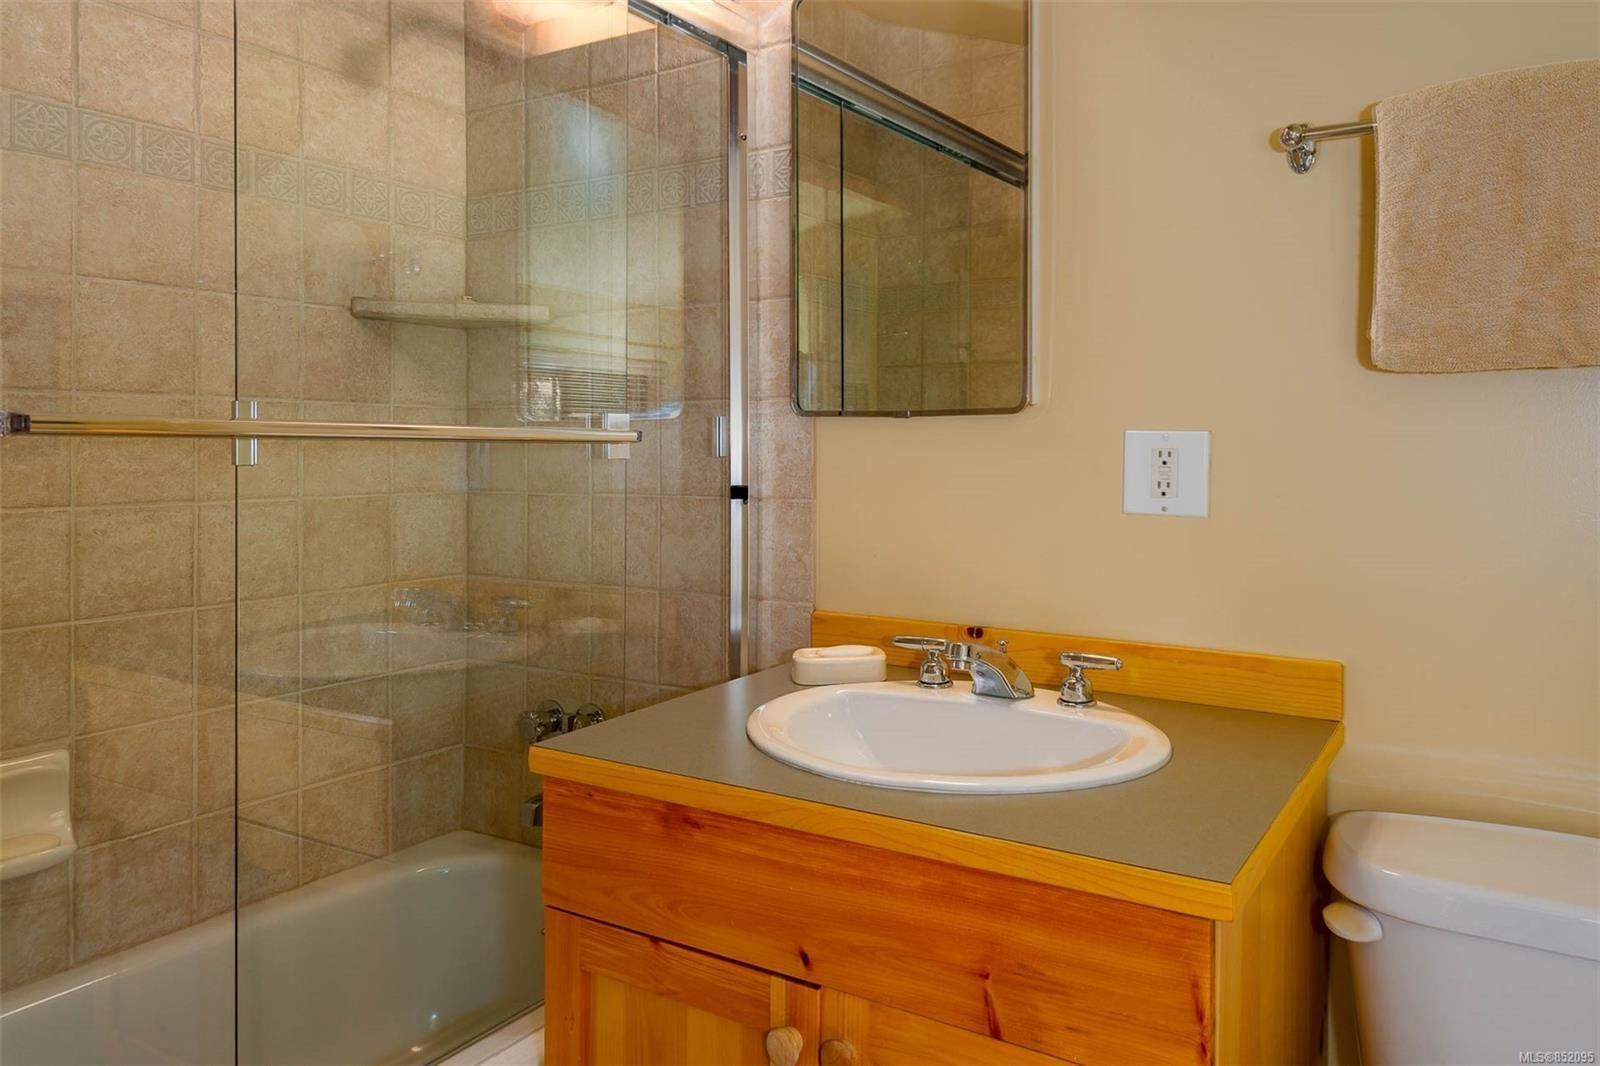 Photo 24: Photos: 236 McGill Rd in : GI Salt Spring House for sale (Gulf Islands)  : MLS®# 852095